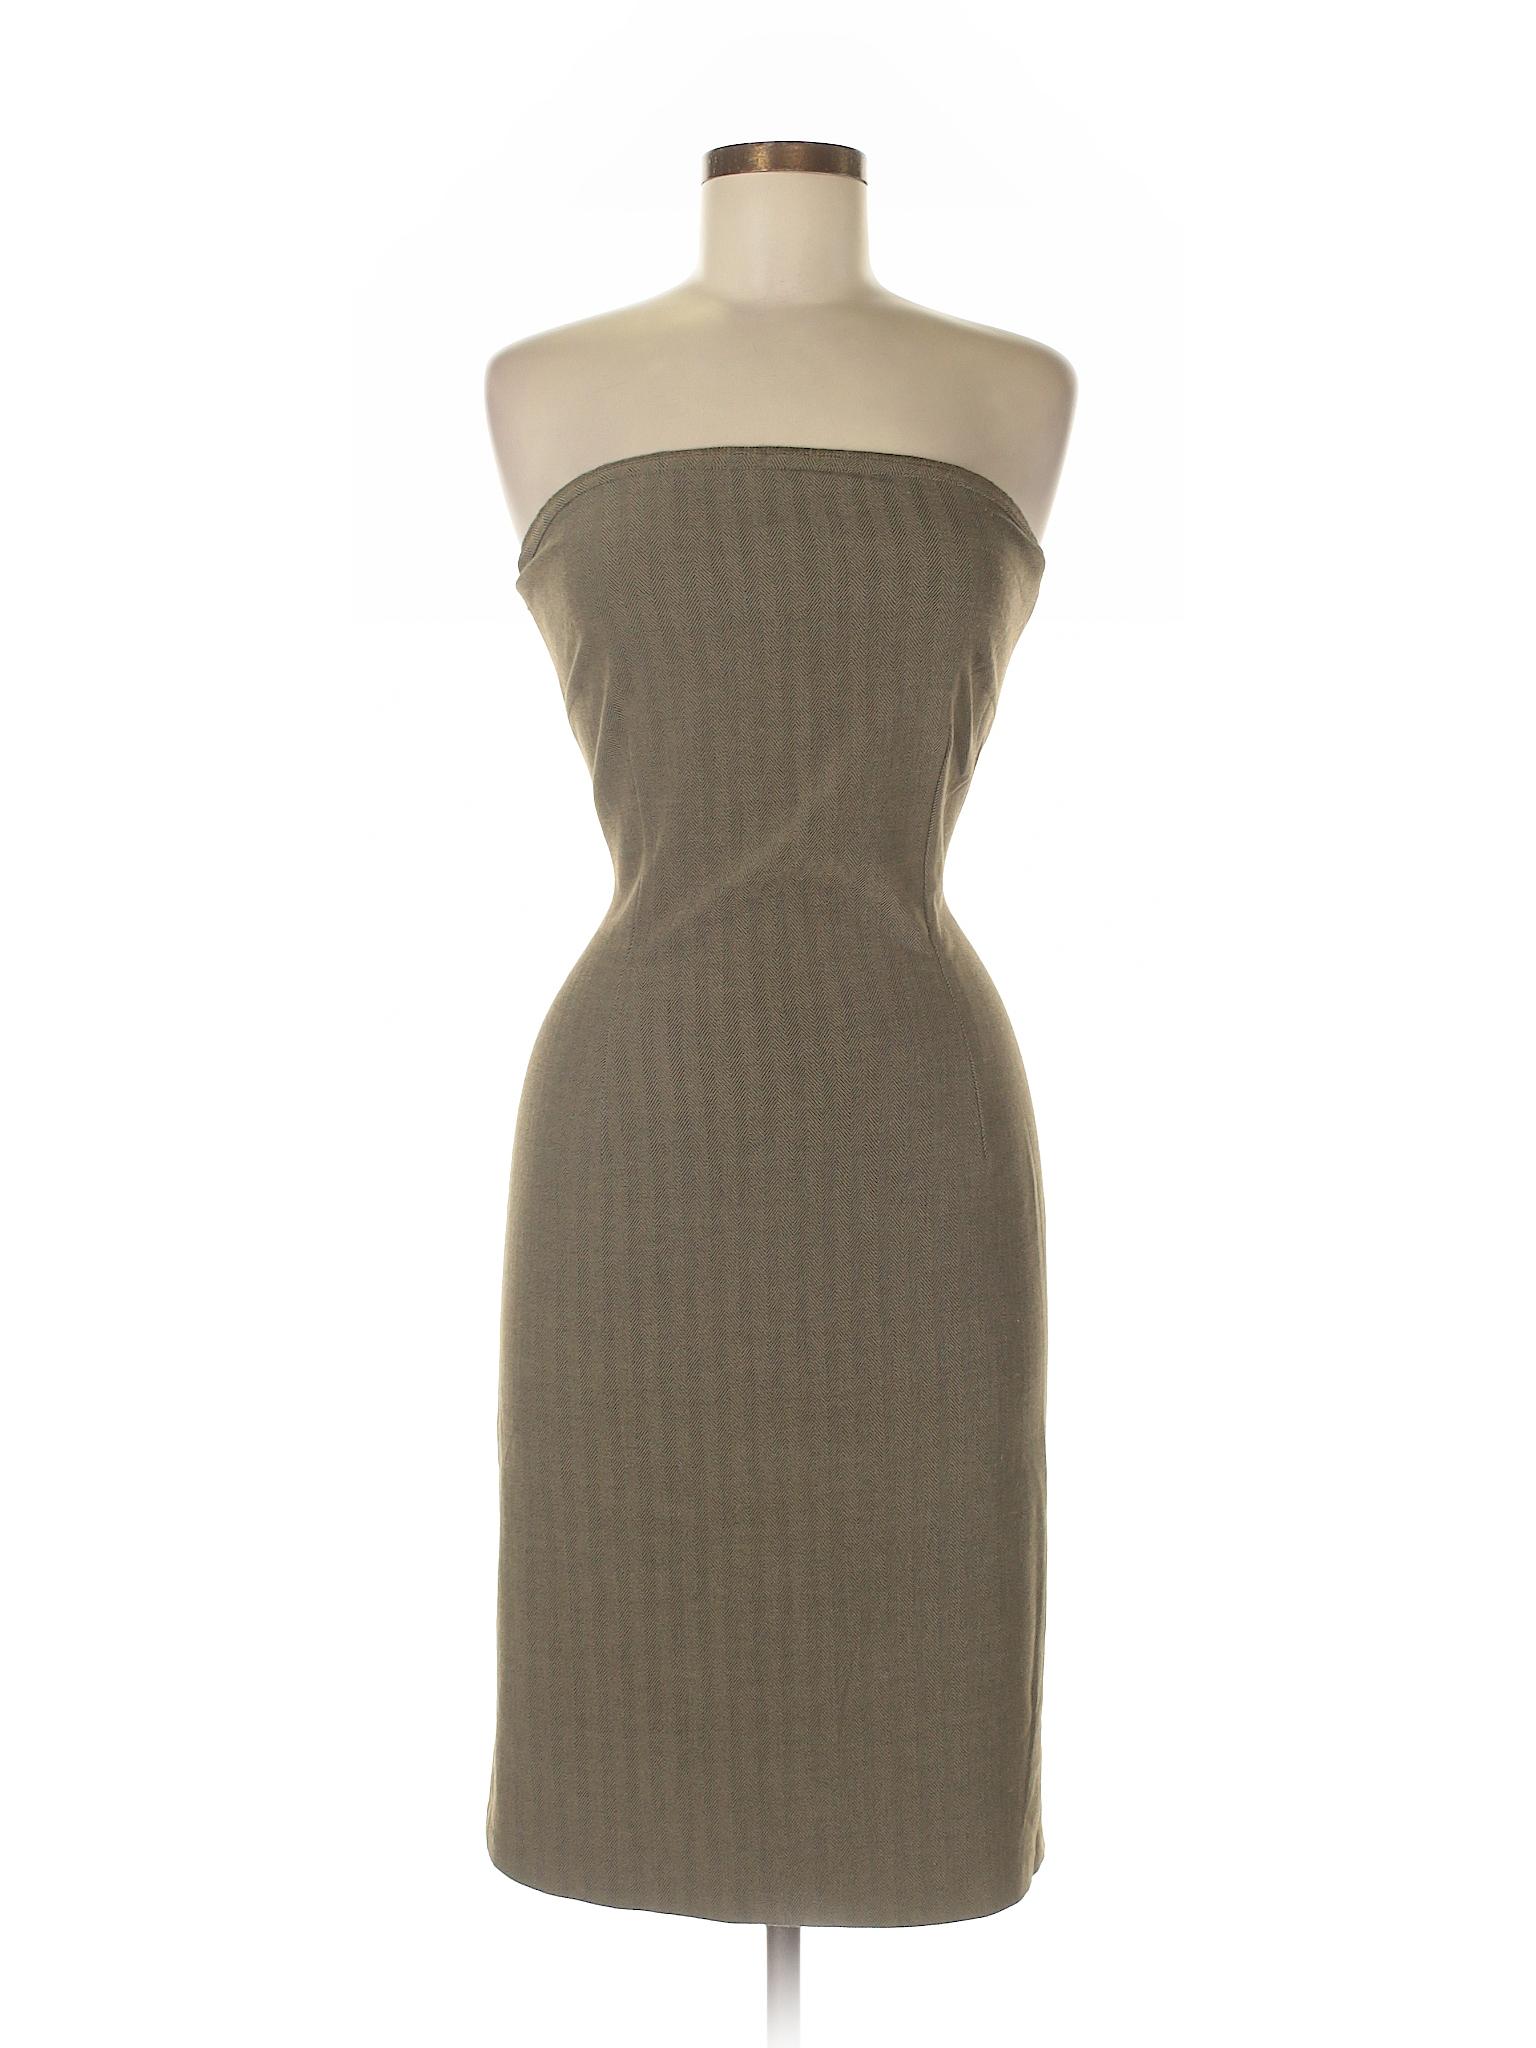 News Casual Dress News Newport Selling Newport Dress Casual Selling Selling nzxZaw08q